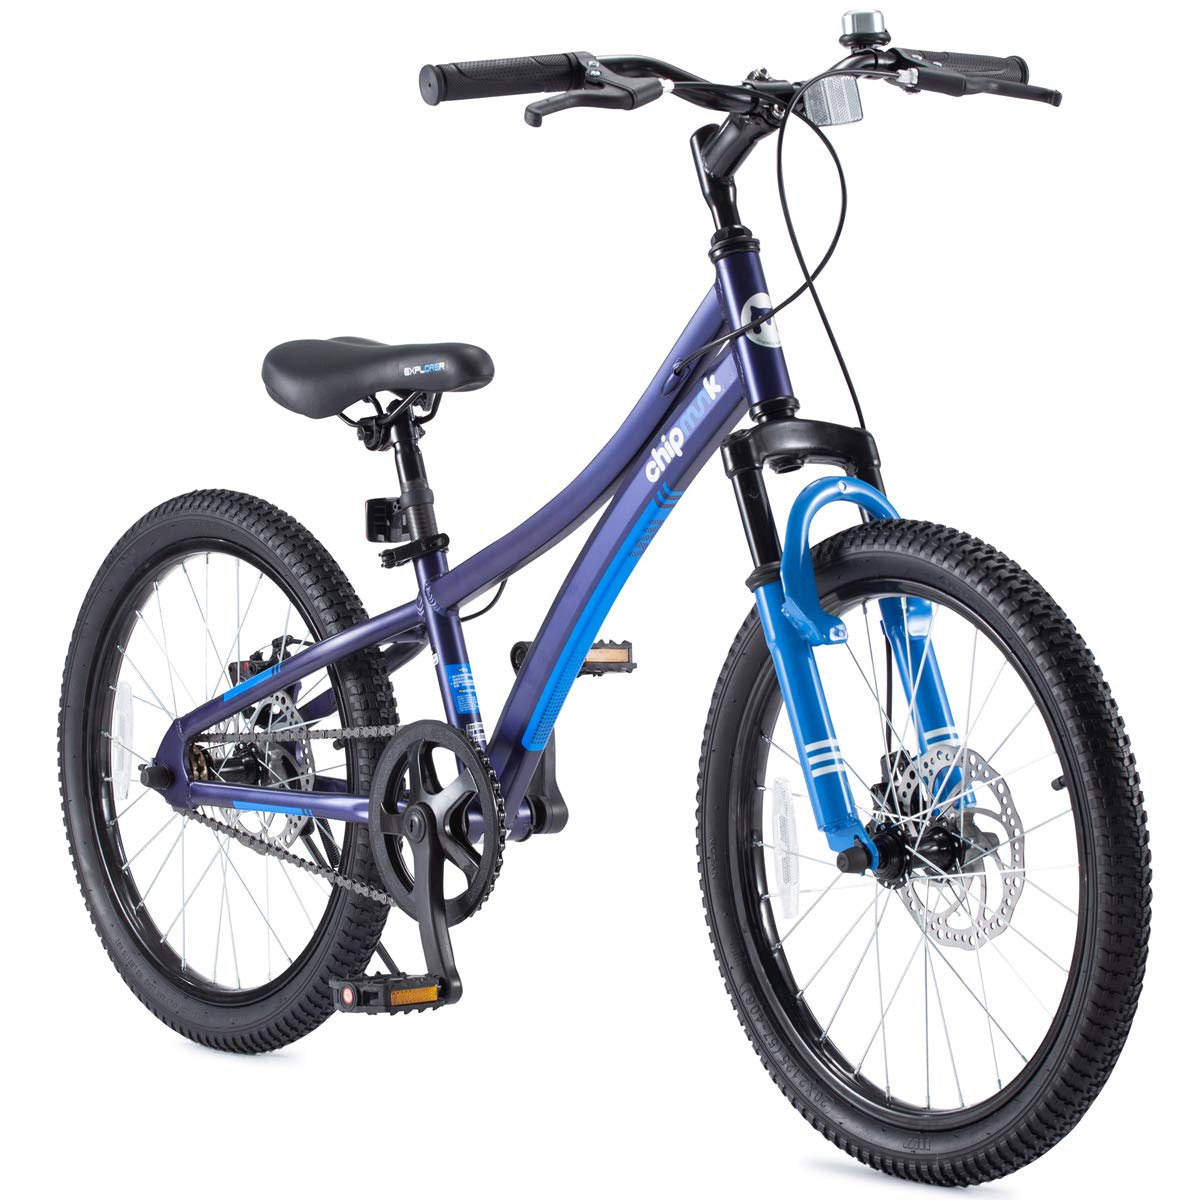 Royalbaby Explorer Bicycle Suspension Aluminum